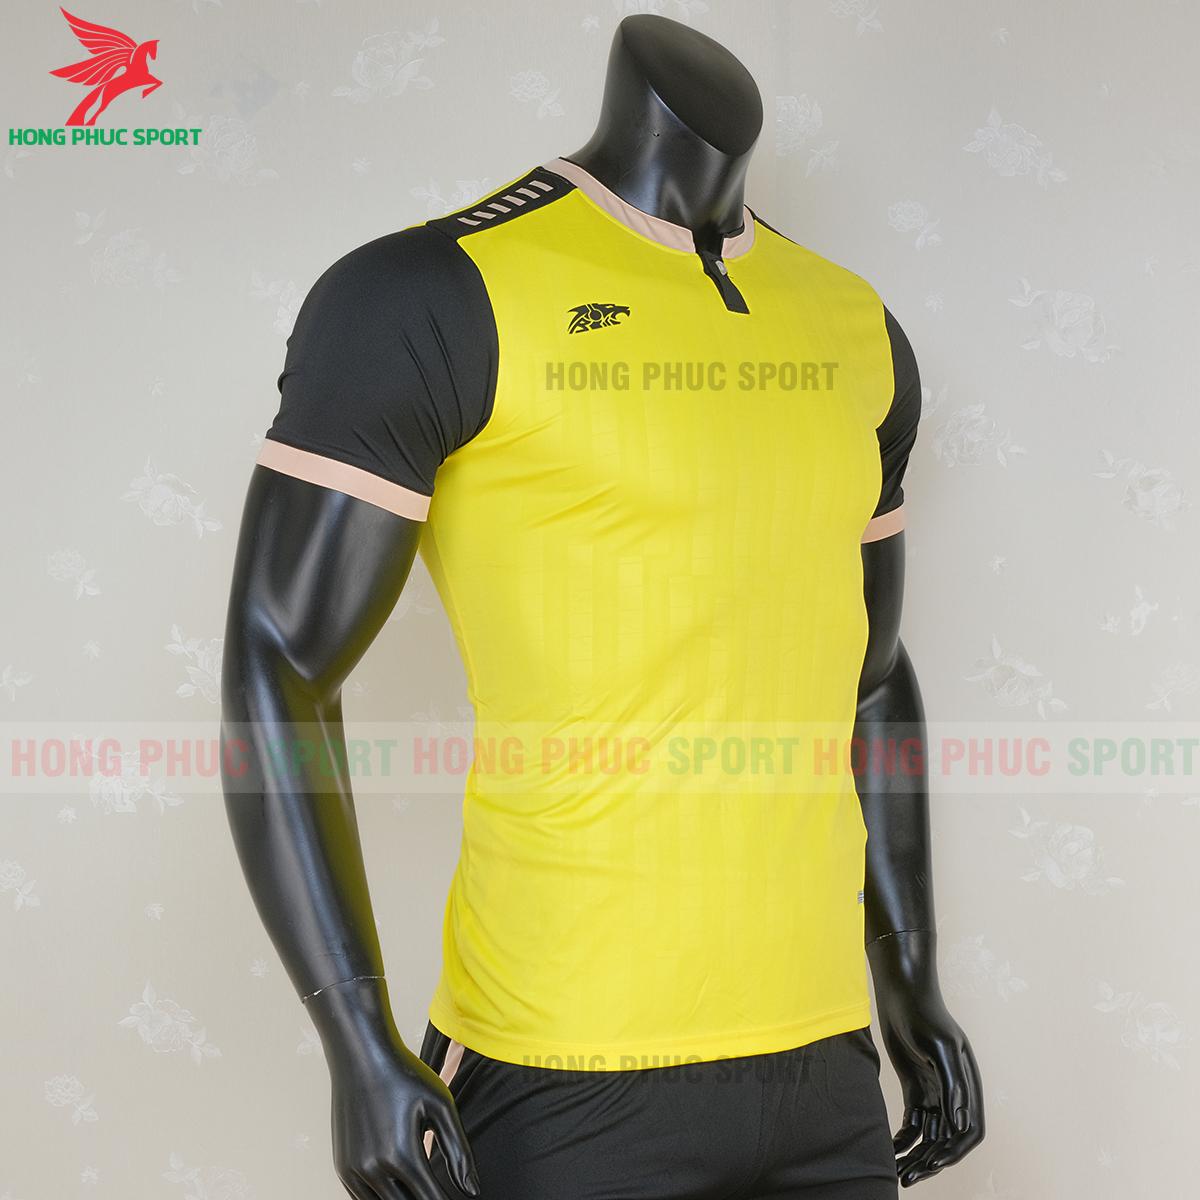 https://cdn.hongphucsport.com/unsafe/s4.shopbay.vn/files/285/ao-bong-da-khong-logo-riki-neck-mau-vang-2-5f71ae086e70a.png